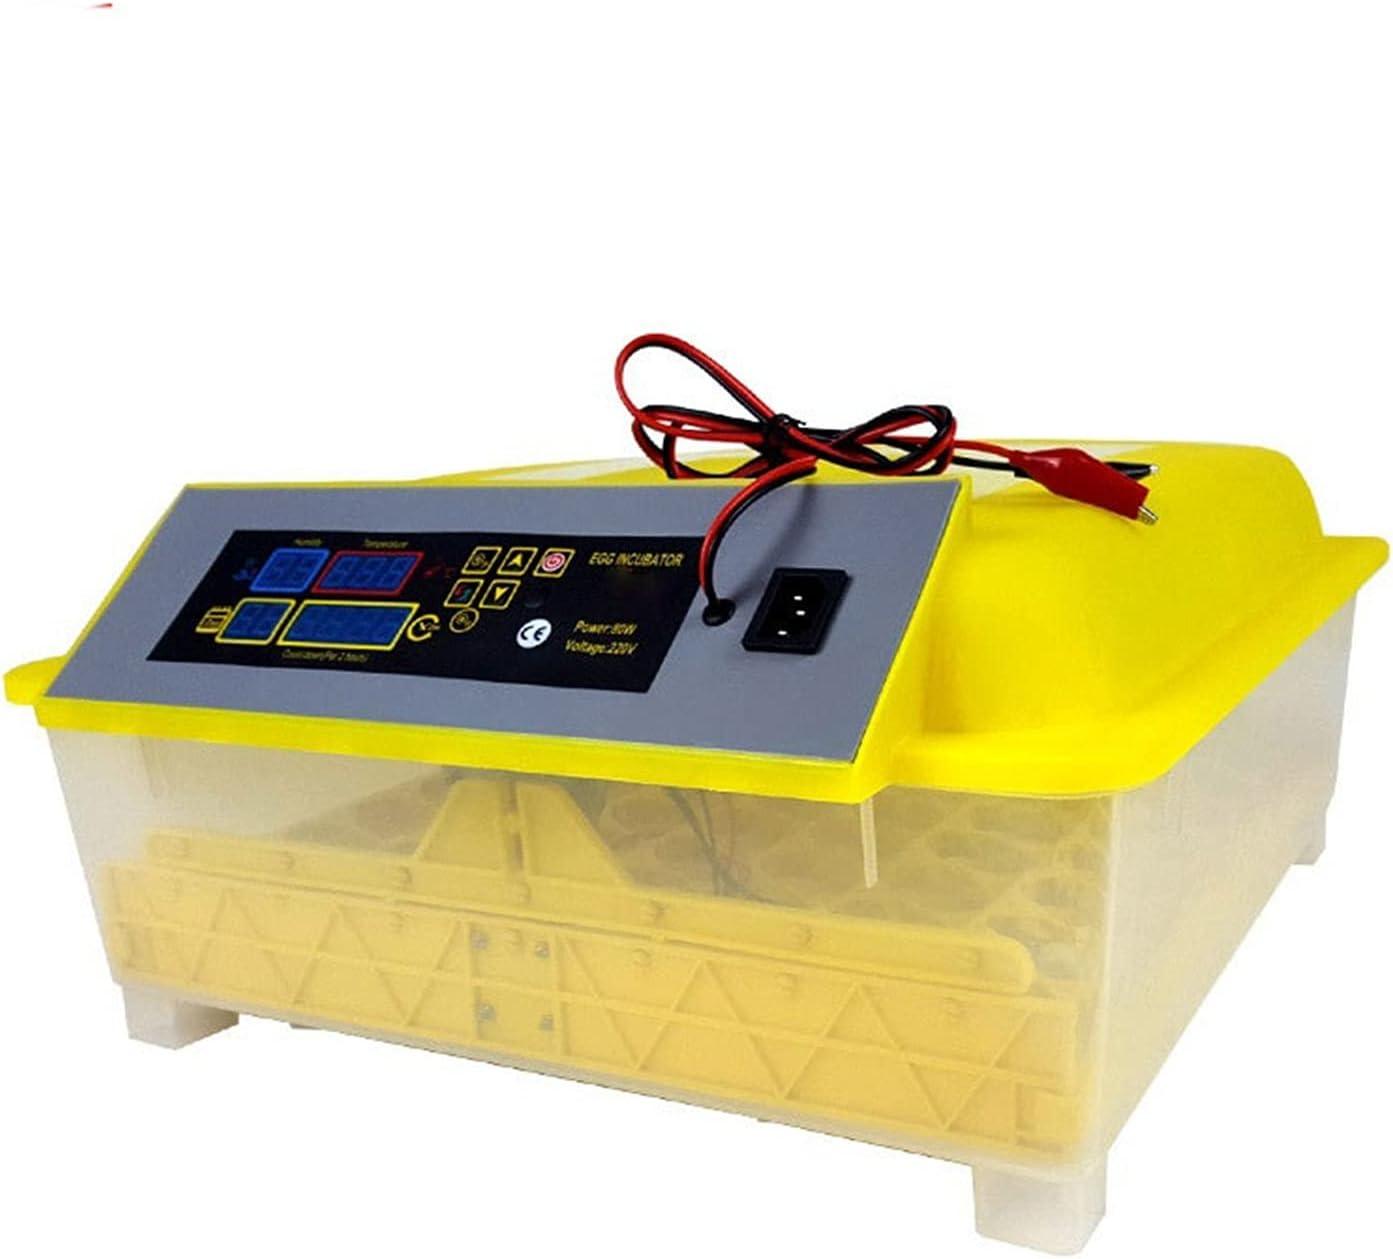 HUACHEN-LS Automatic Egg Max 43% OFF Incubator 56 Power Cheap bargain Dual Chi Incubators